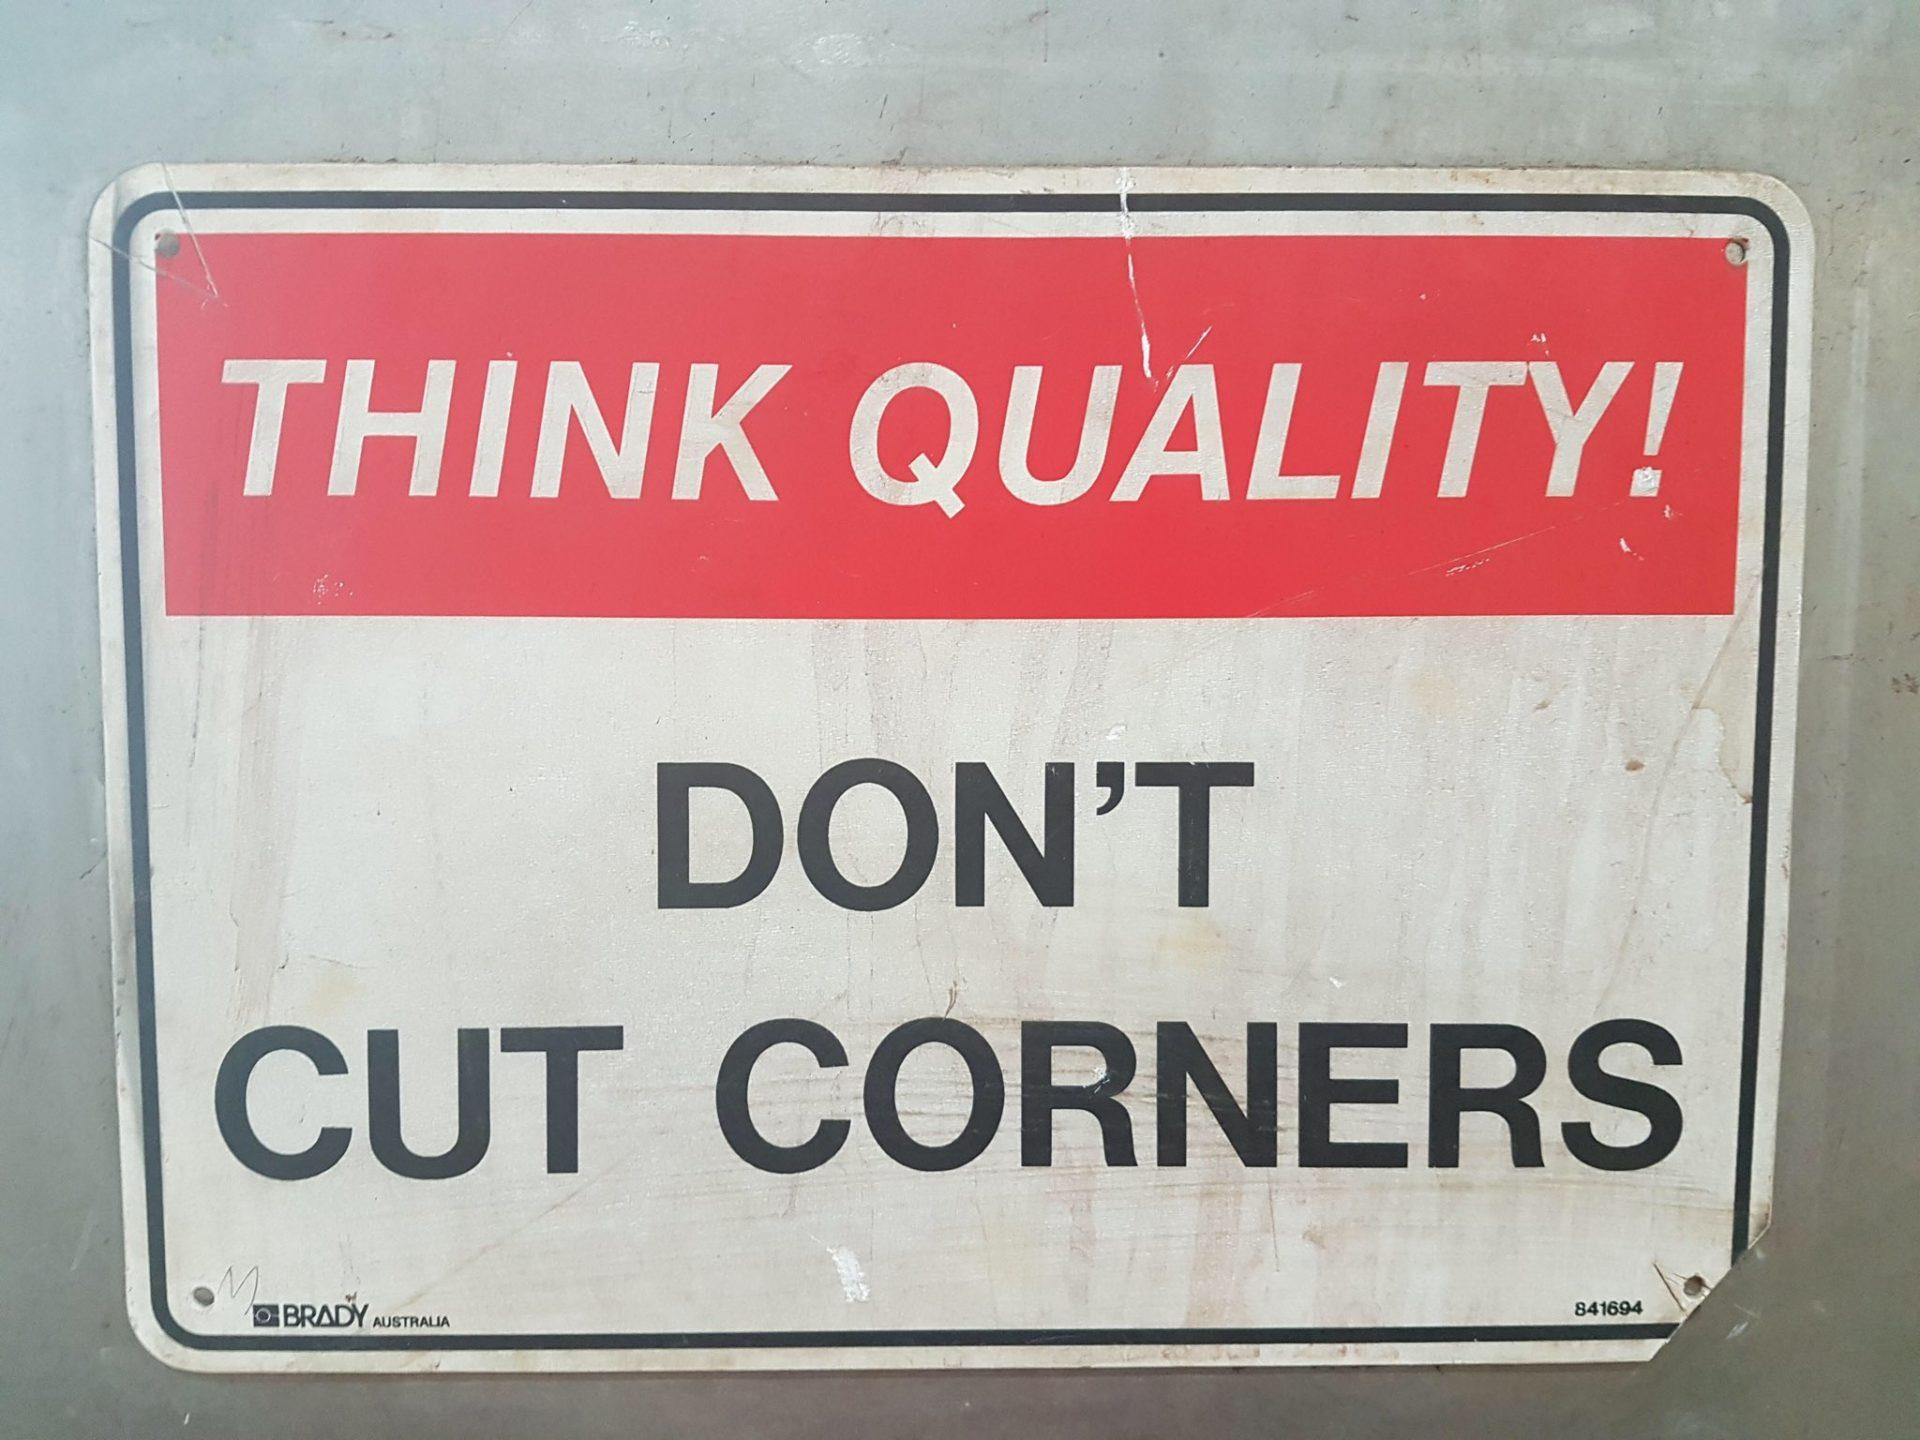 That's a bit ironic! 😀